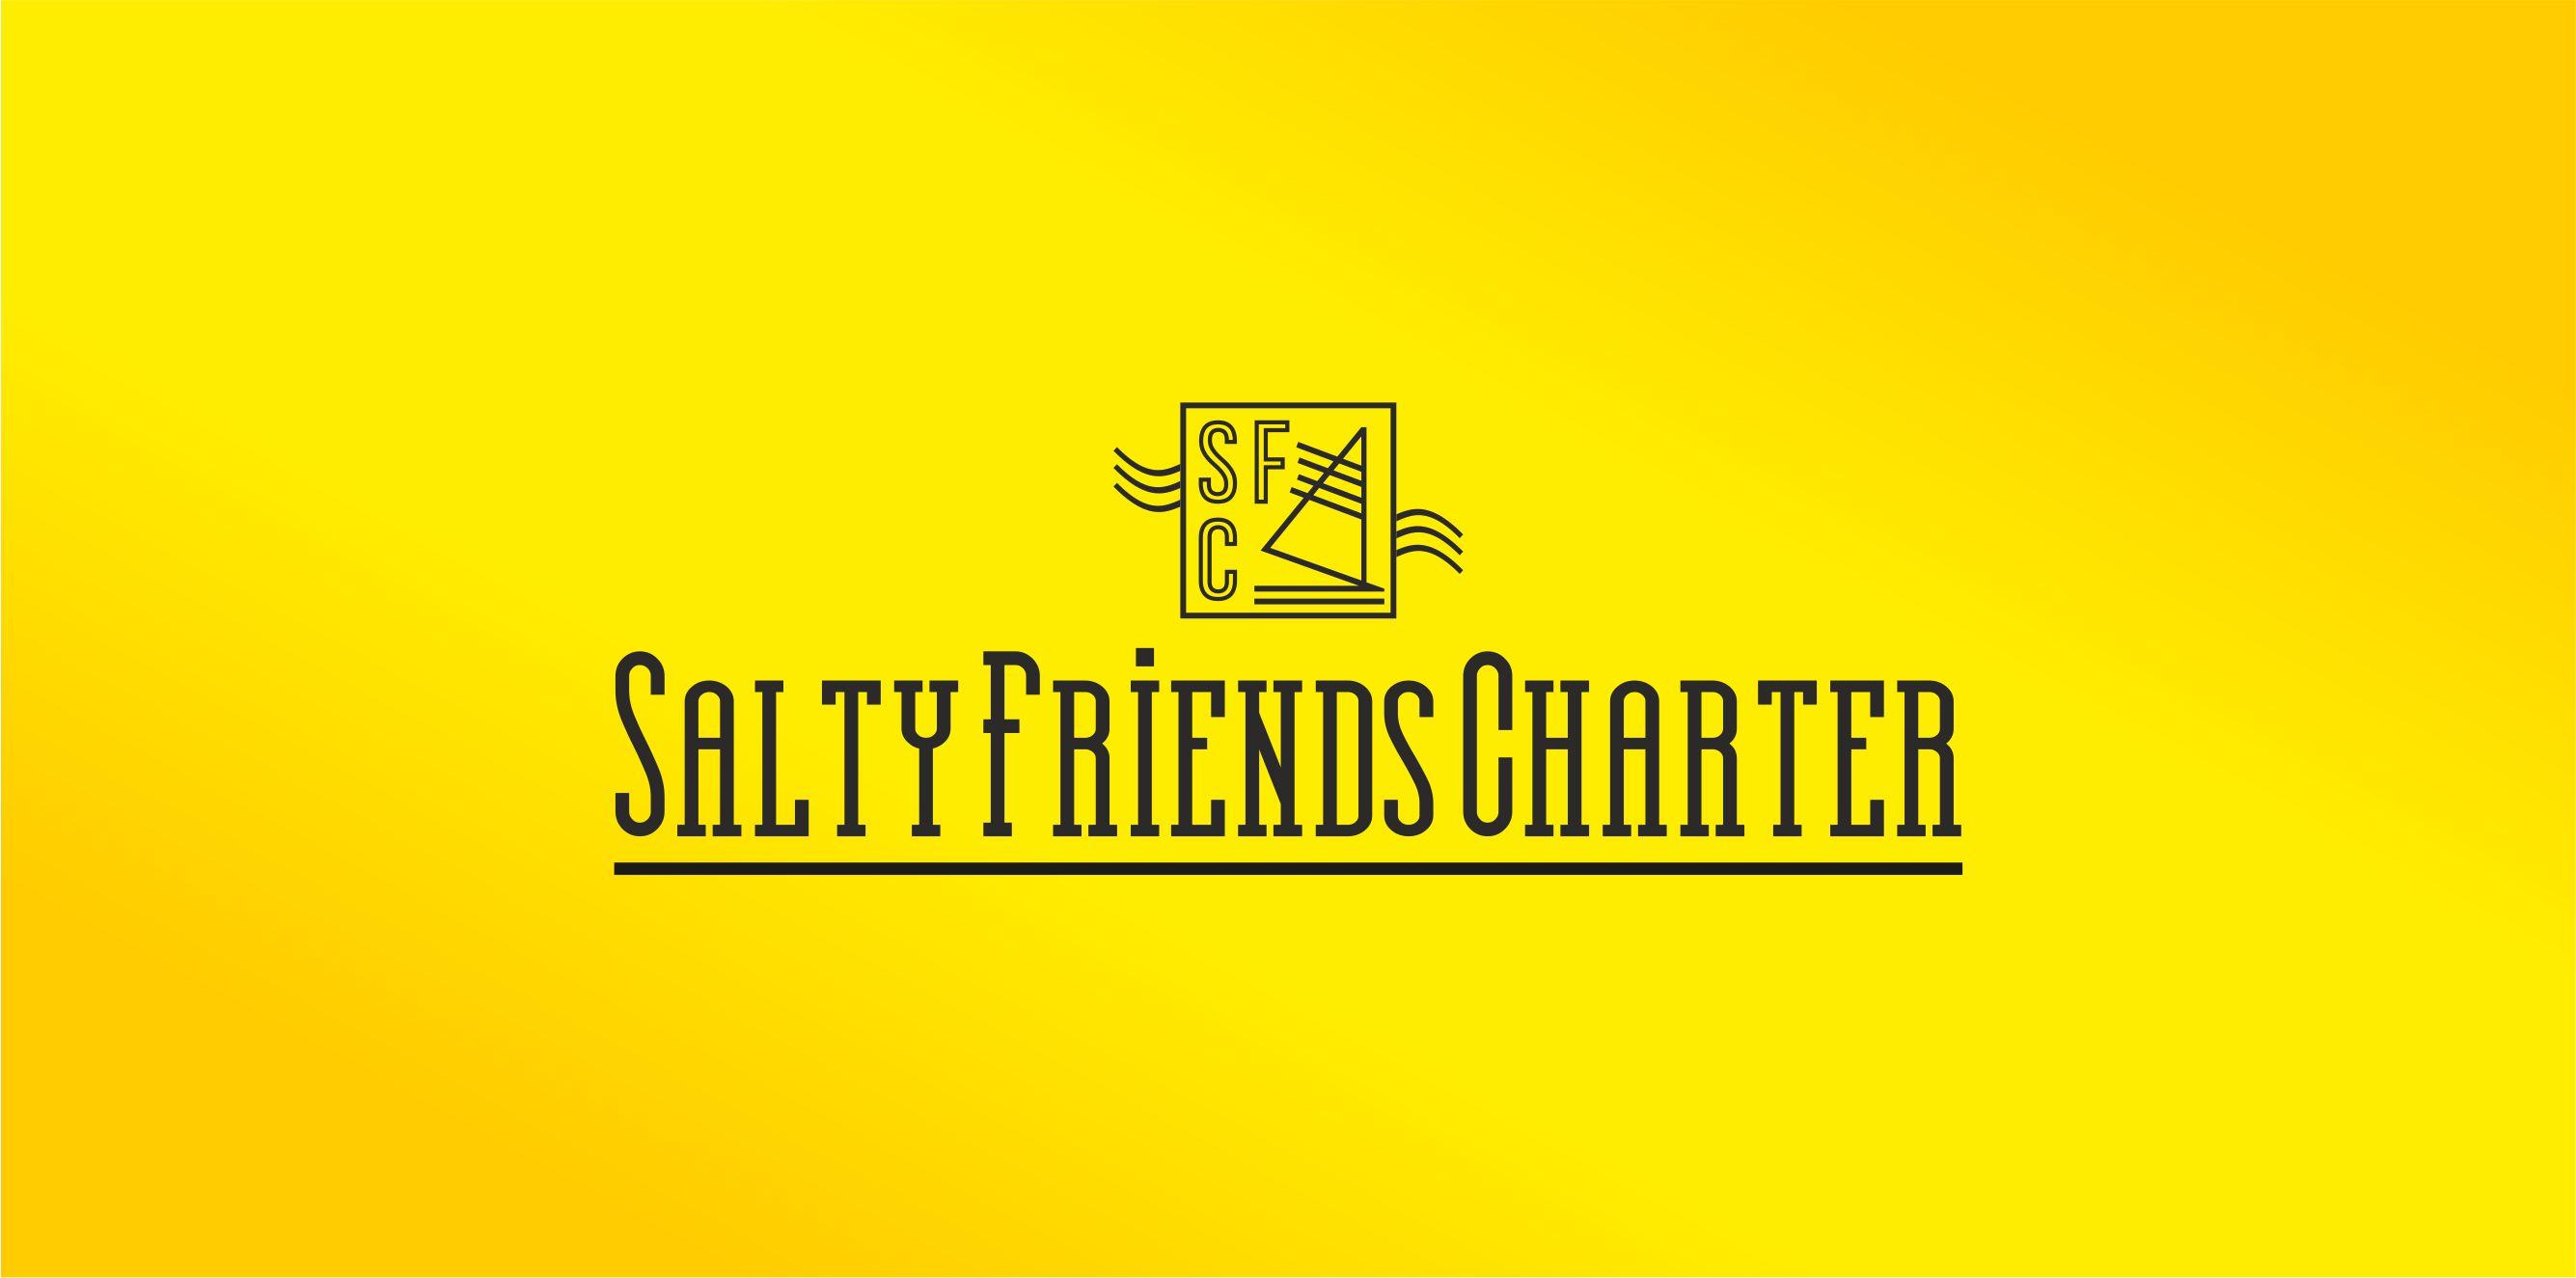 Разработка логотипа и наименования для чартерной компании  фото f_6735a8e7da88b1ad.jpg